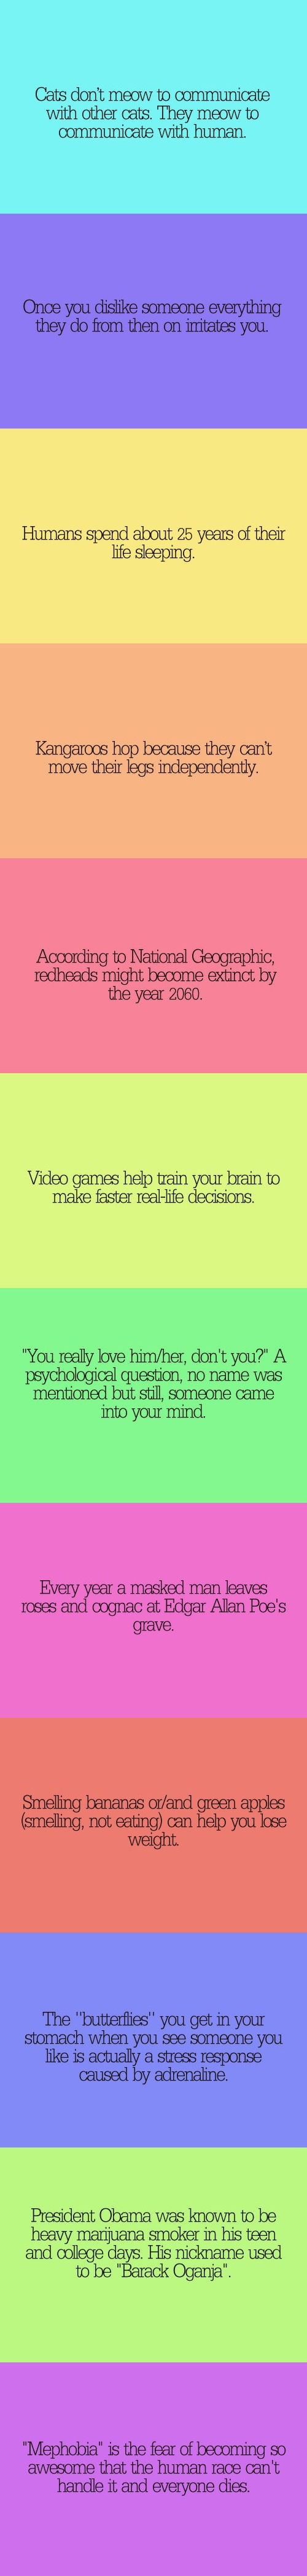 Psycho Facts <<< haha I love these!!